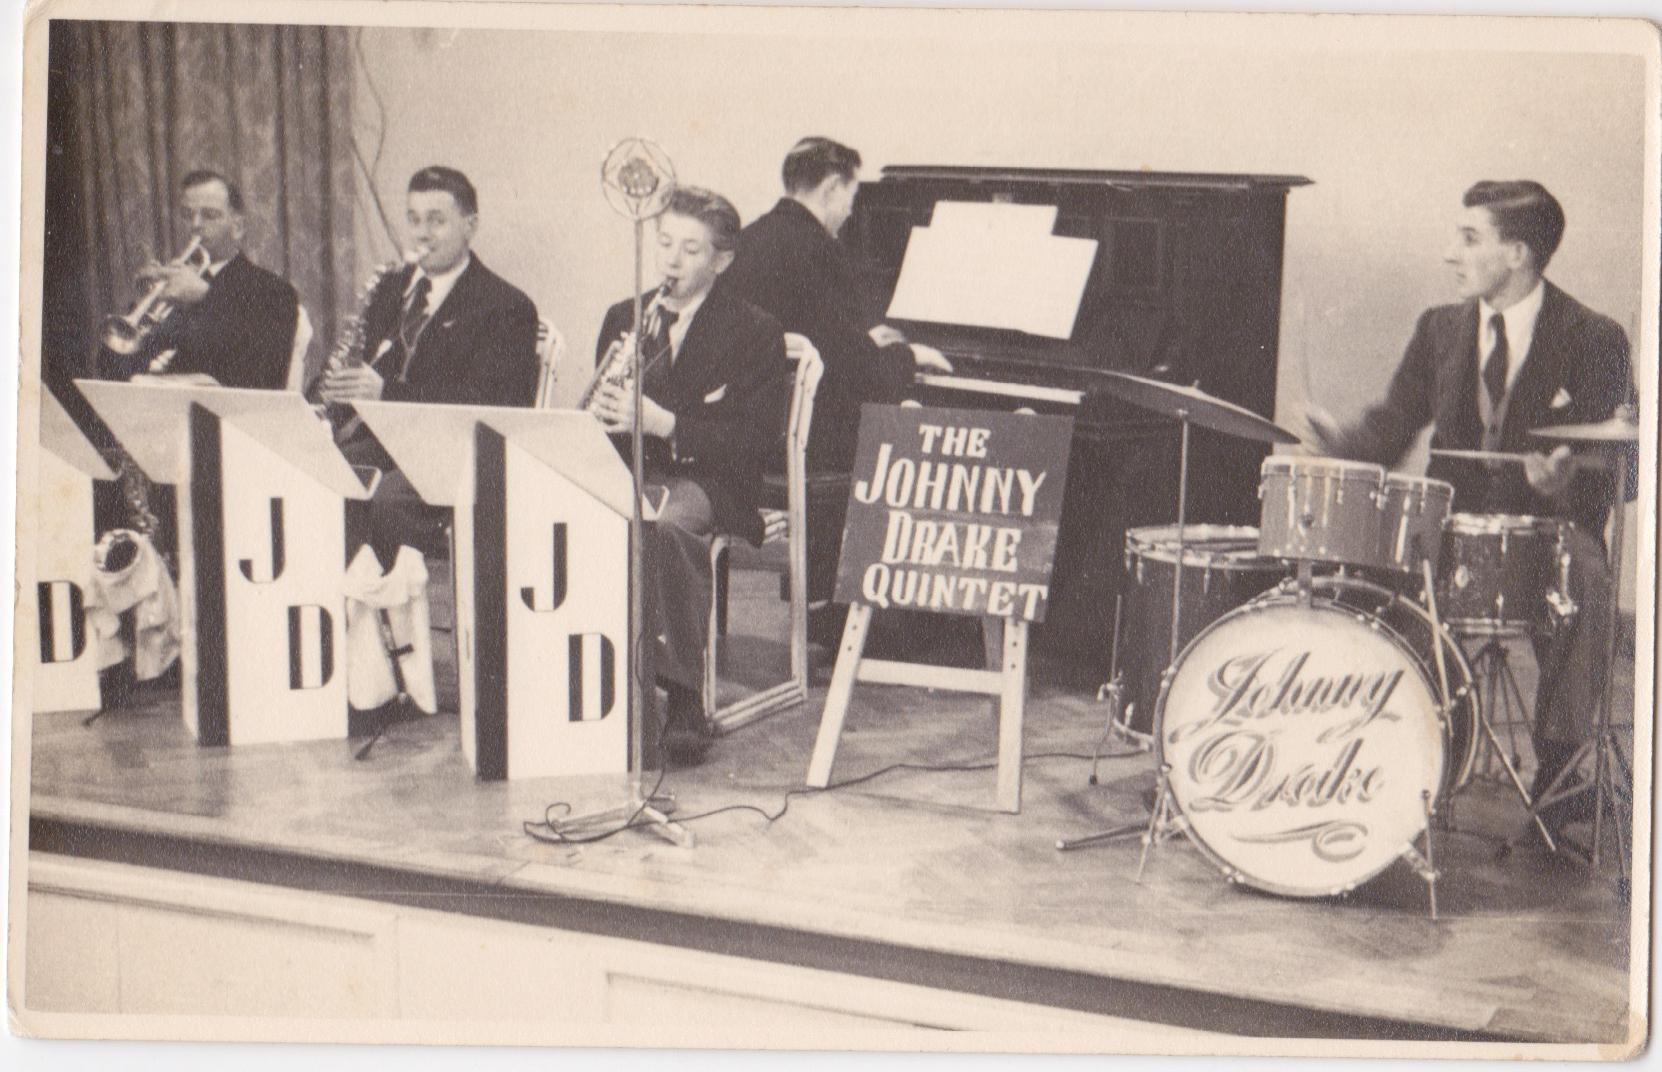 The Johnny Drake Quintet